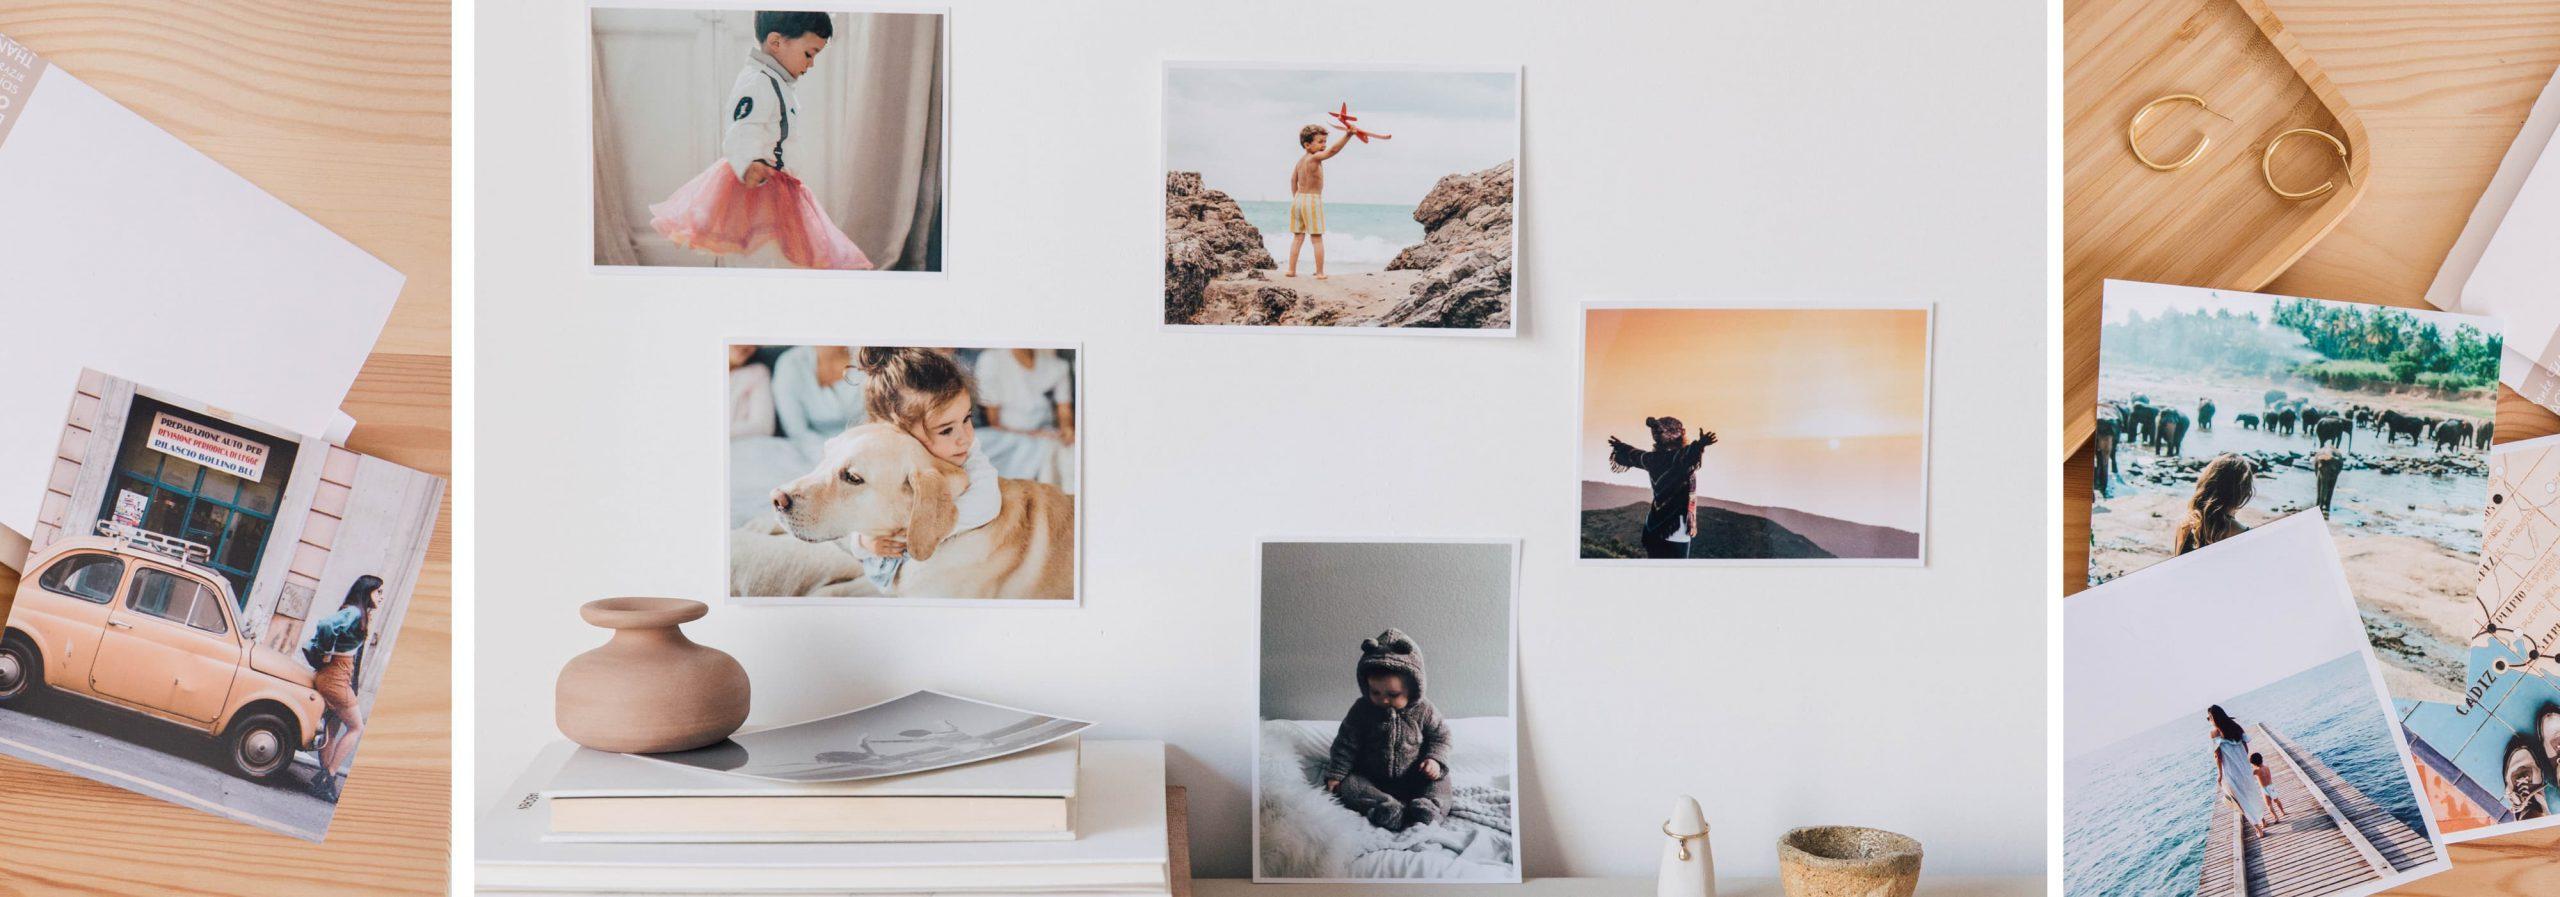 decorar fotos pared